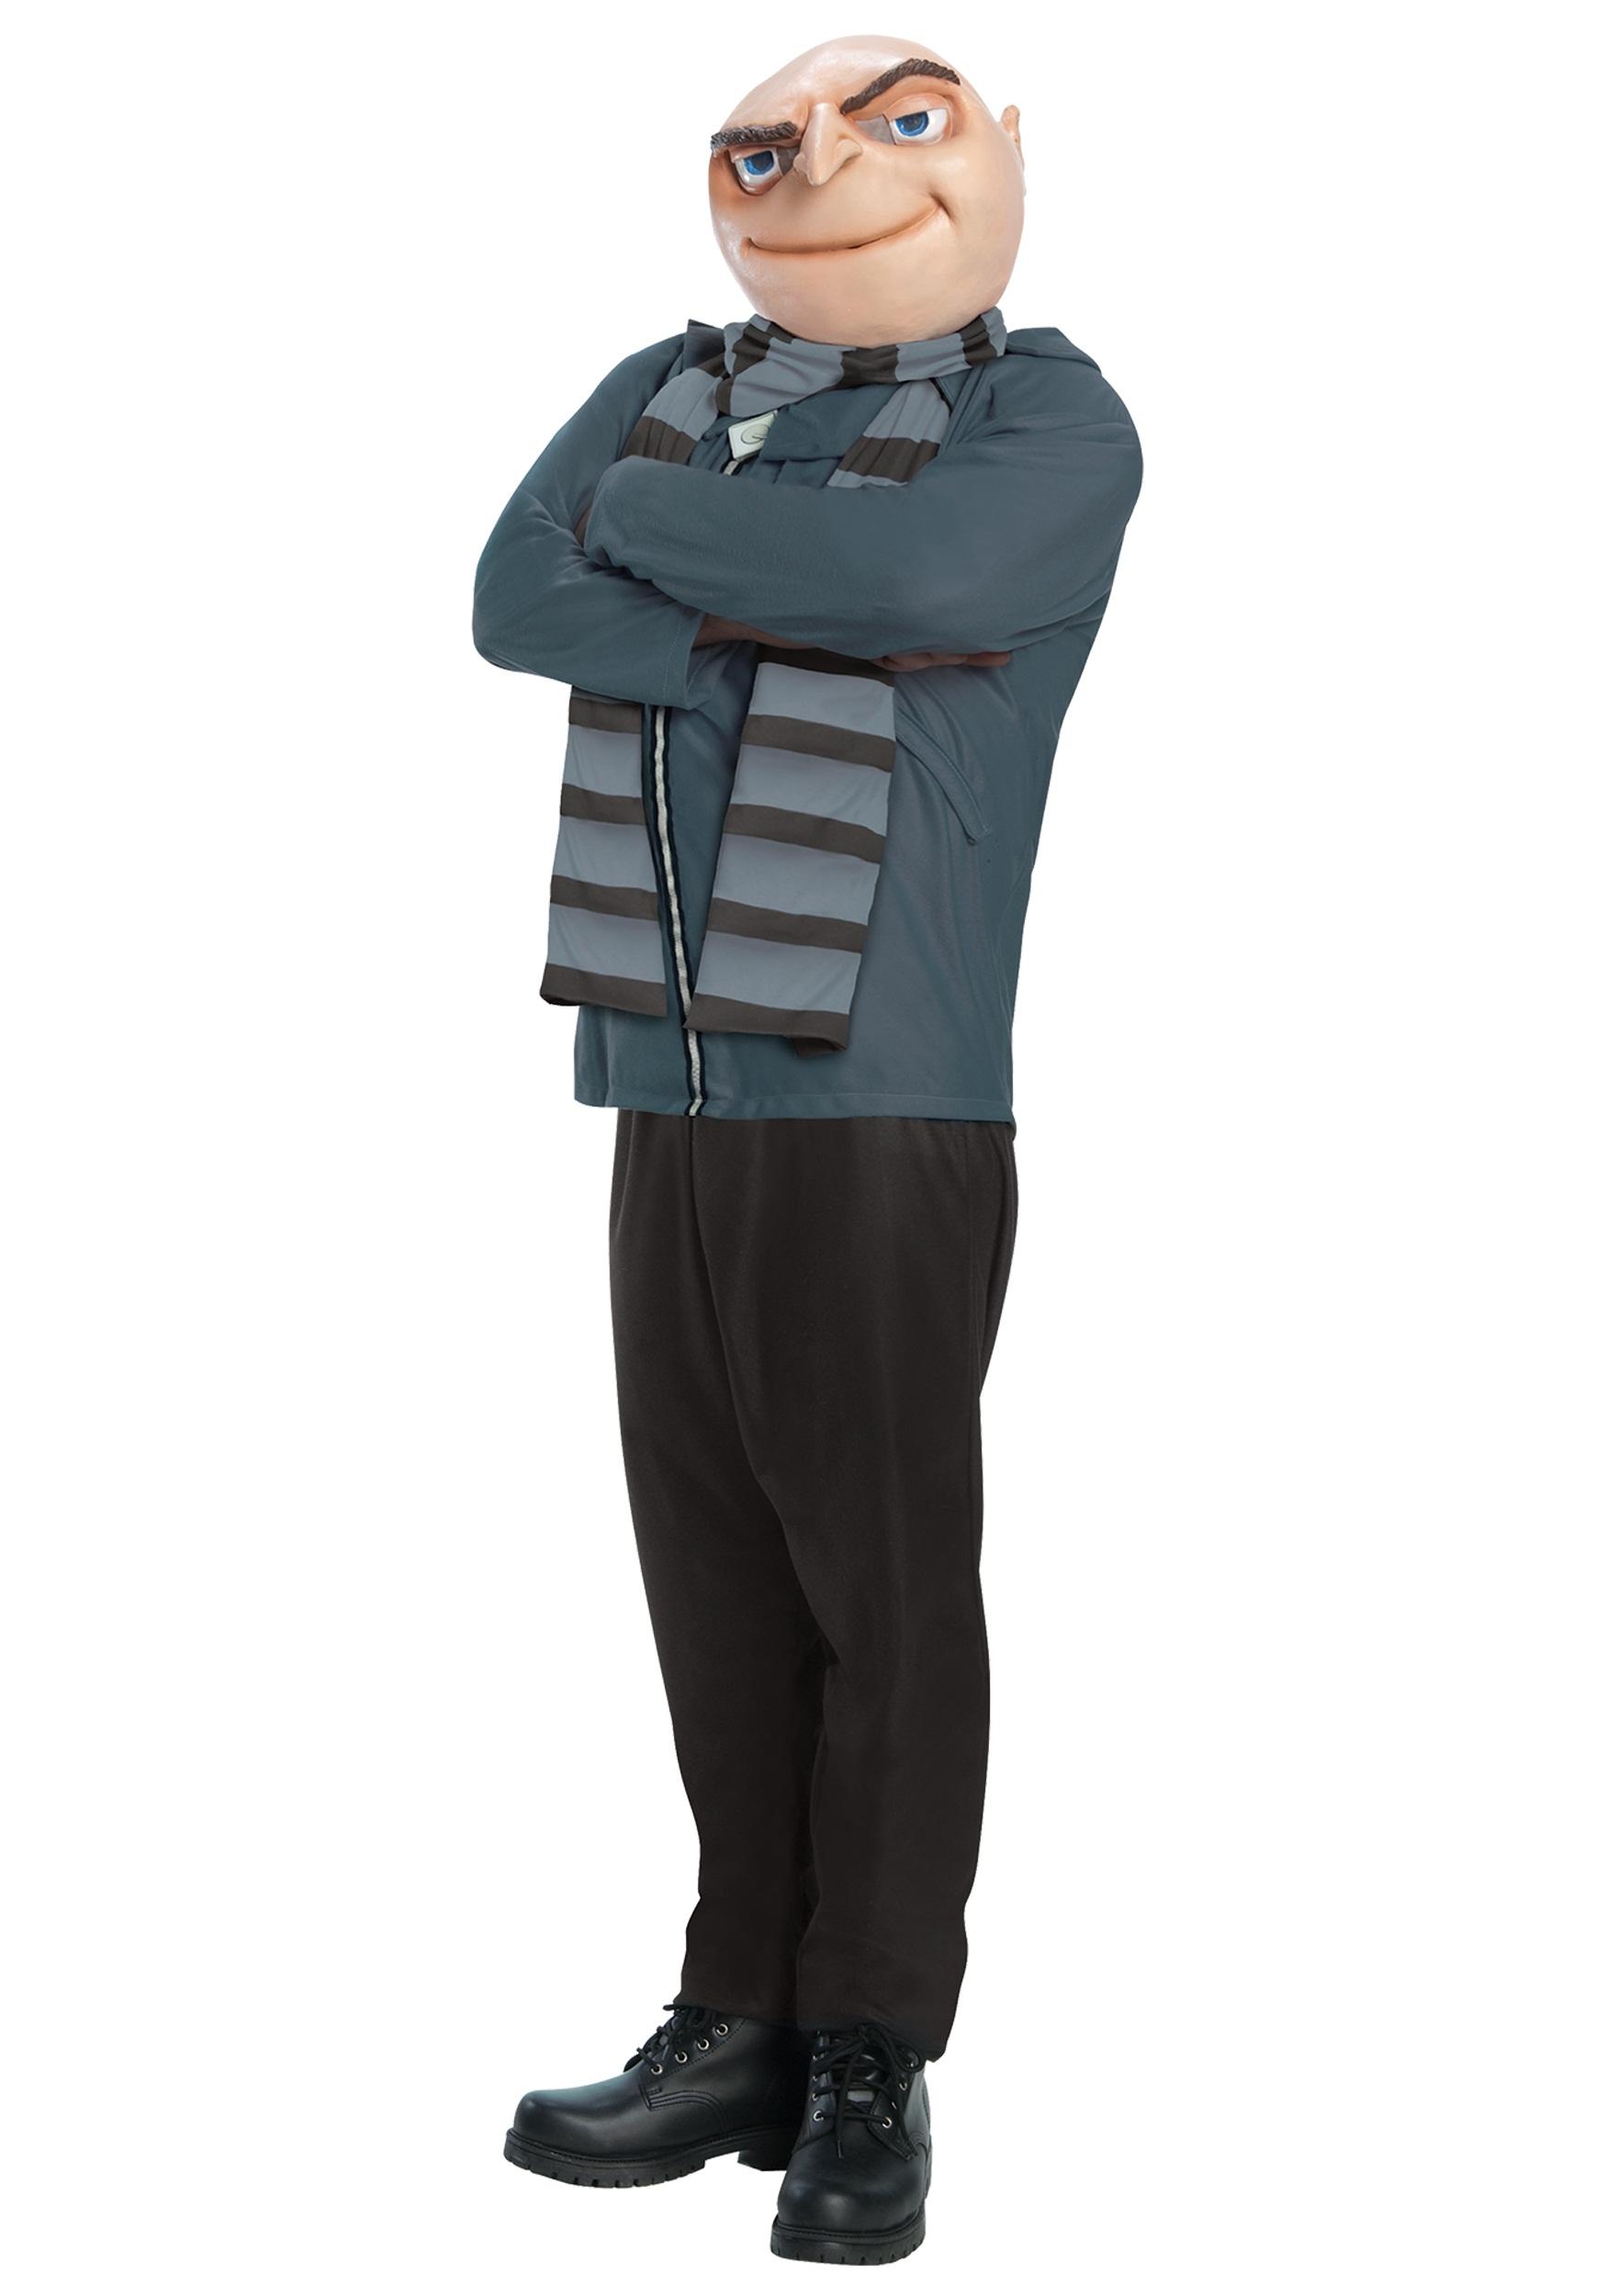 adult-gru-costume.jpg